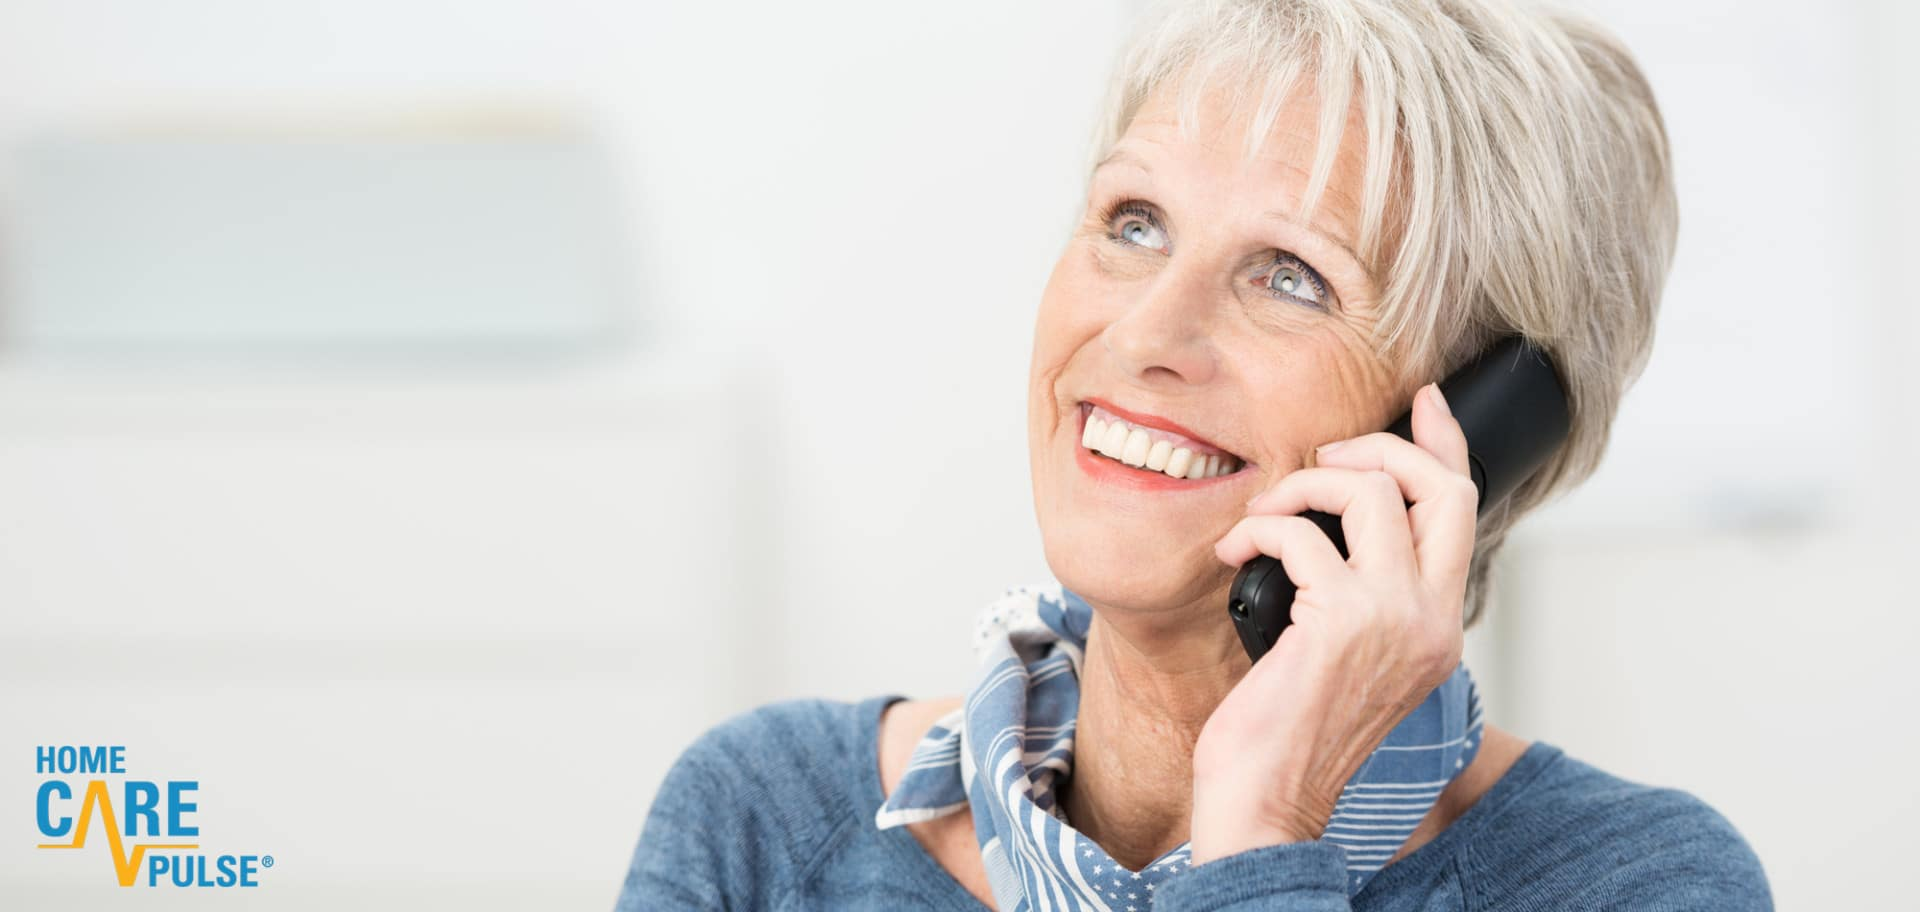 Home Care Phone Etiquette